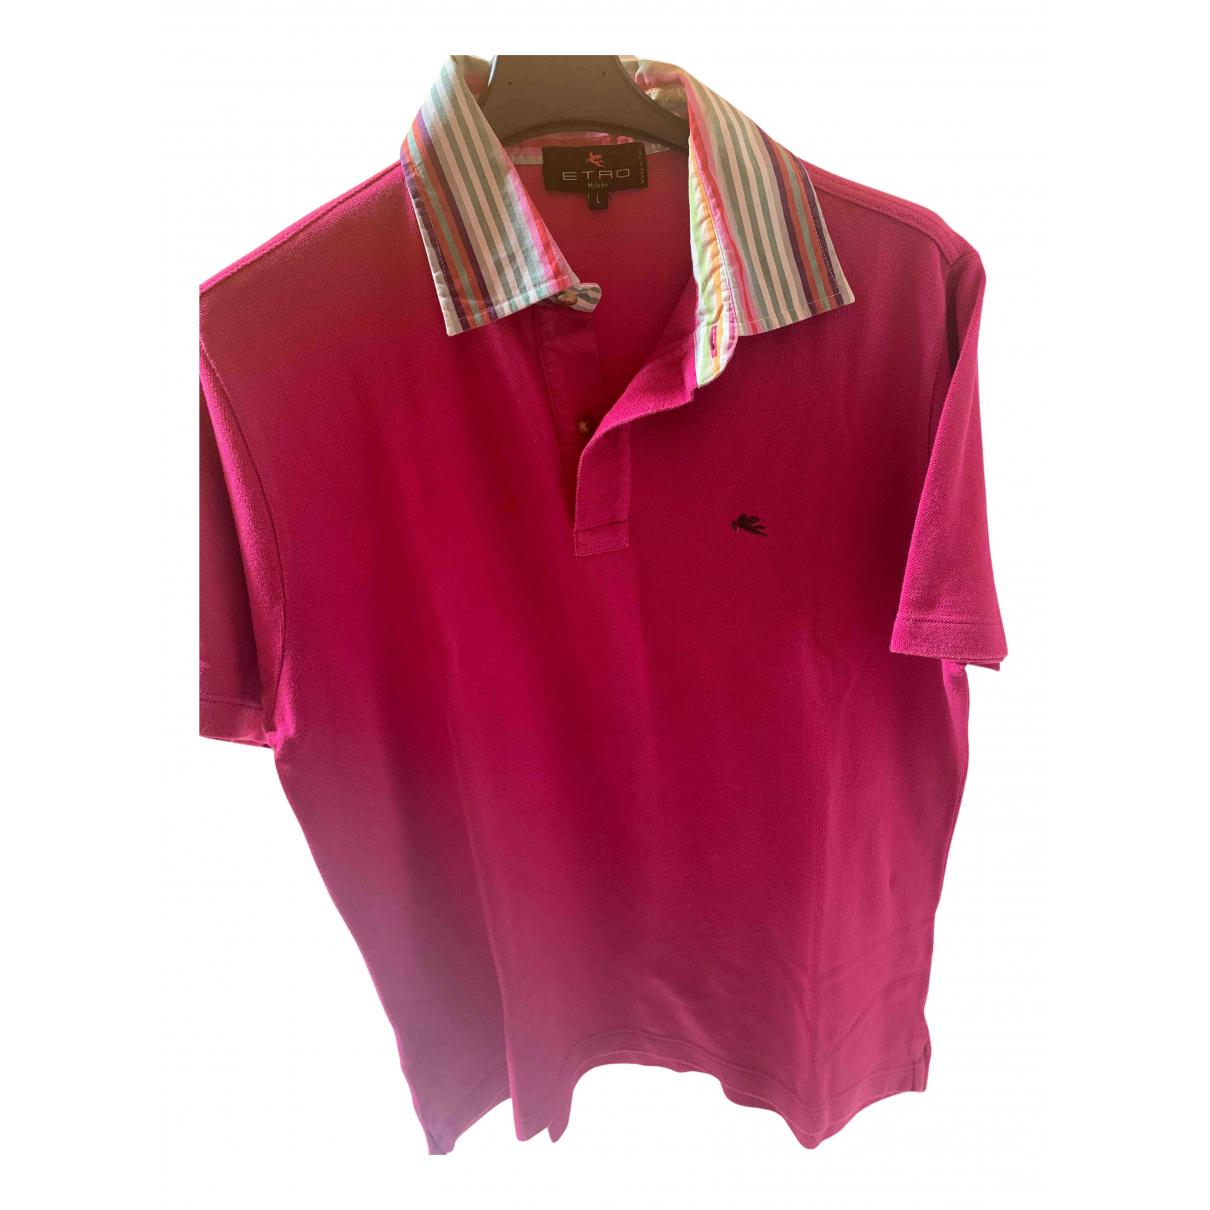 Etro - Polos   pour homme en coton - rose